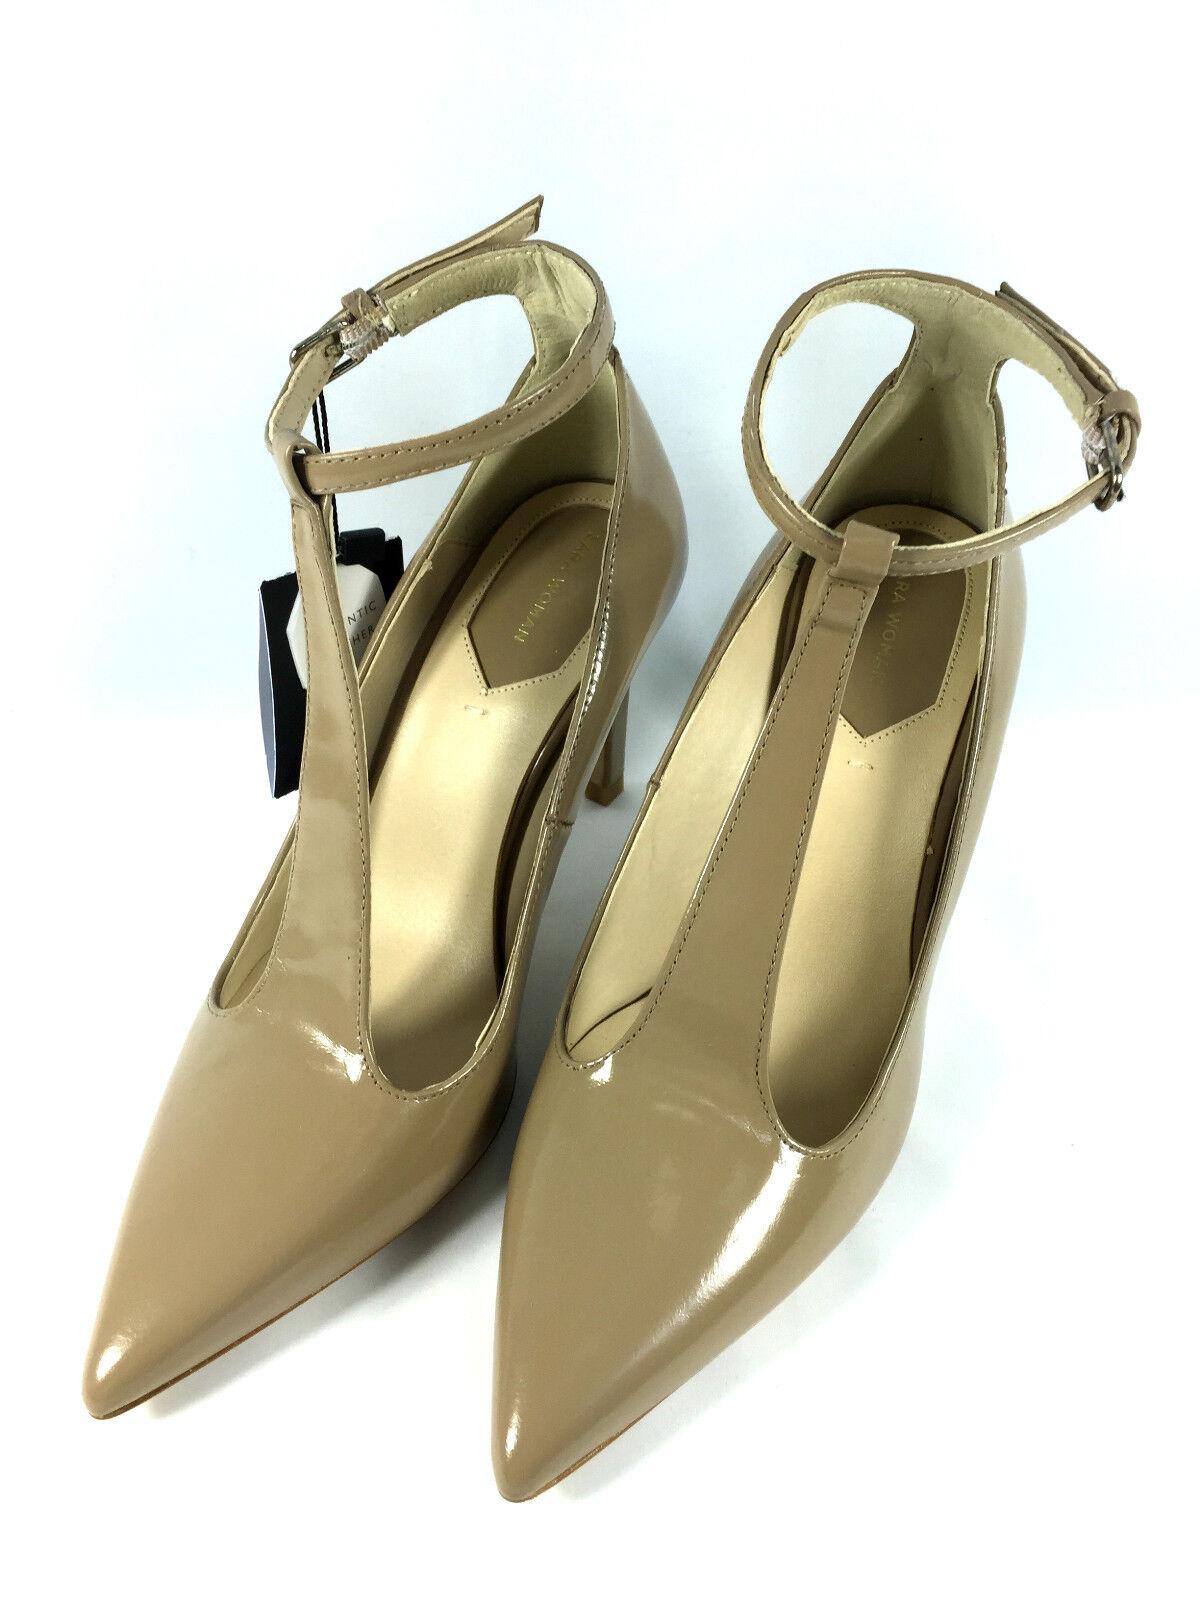 zara beige t bar high heel court shoes size 37 38 39 40 ebay